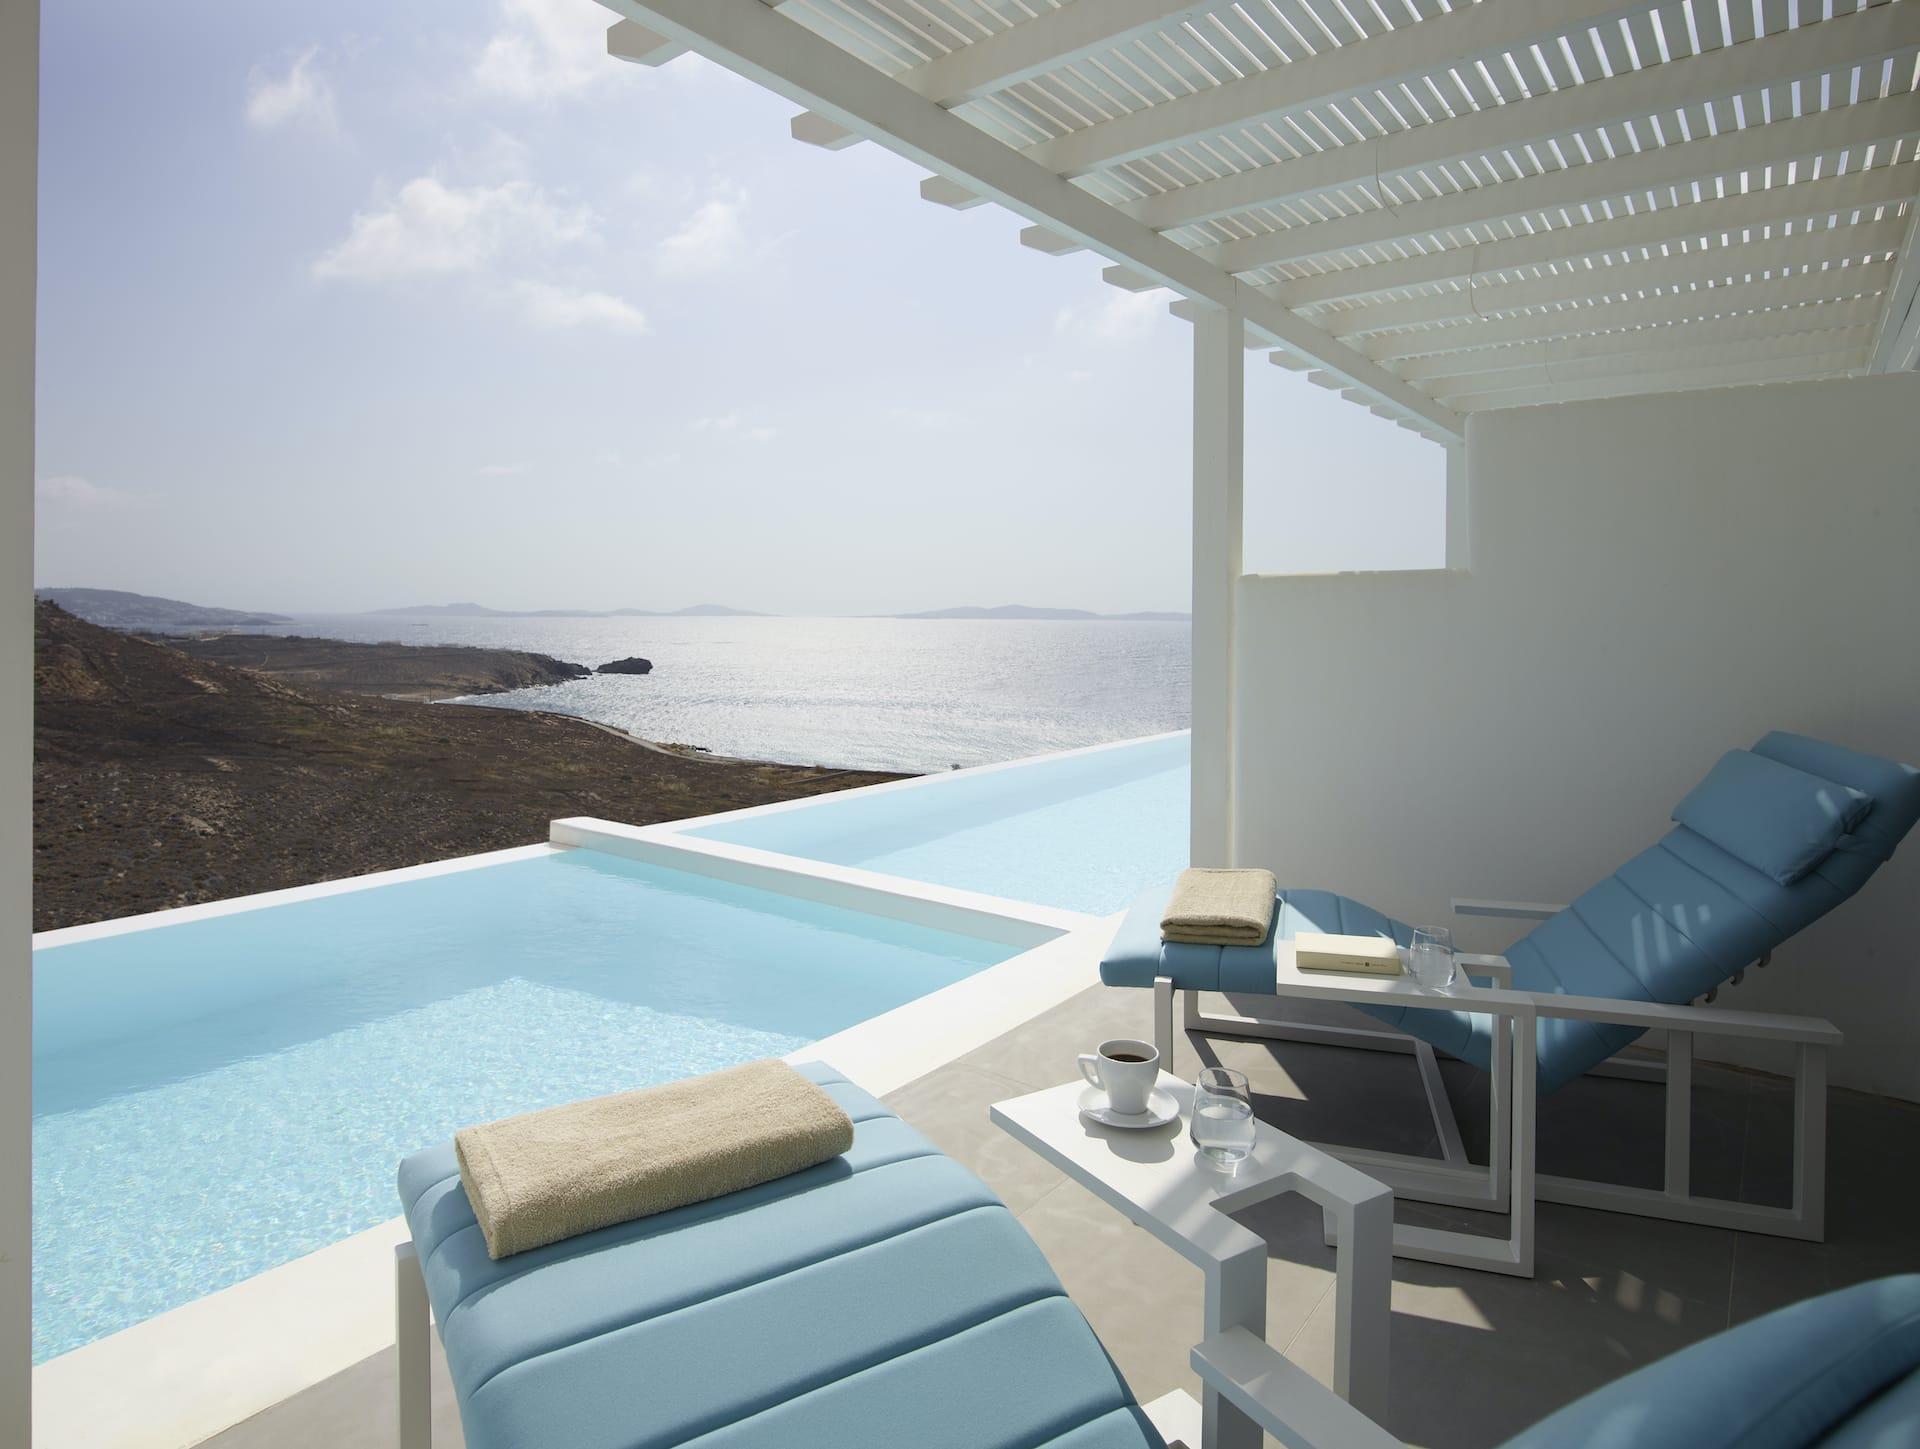 The Epic Blue Hotel Premium Suite in Houlakia, Mykonos